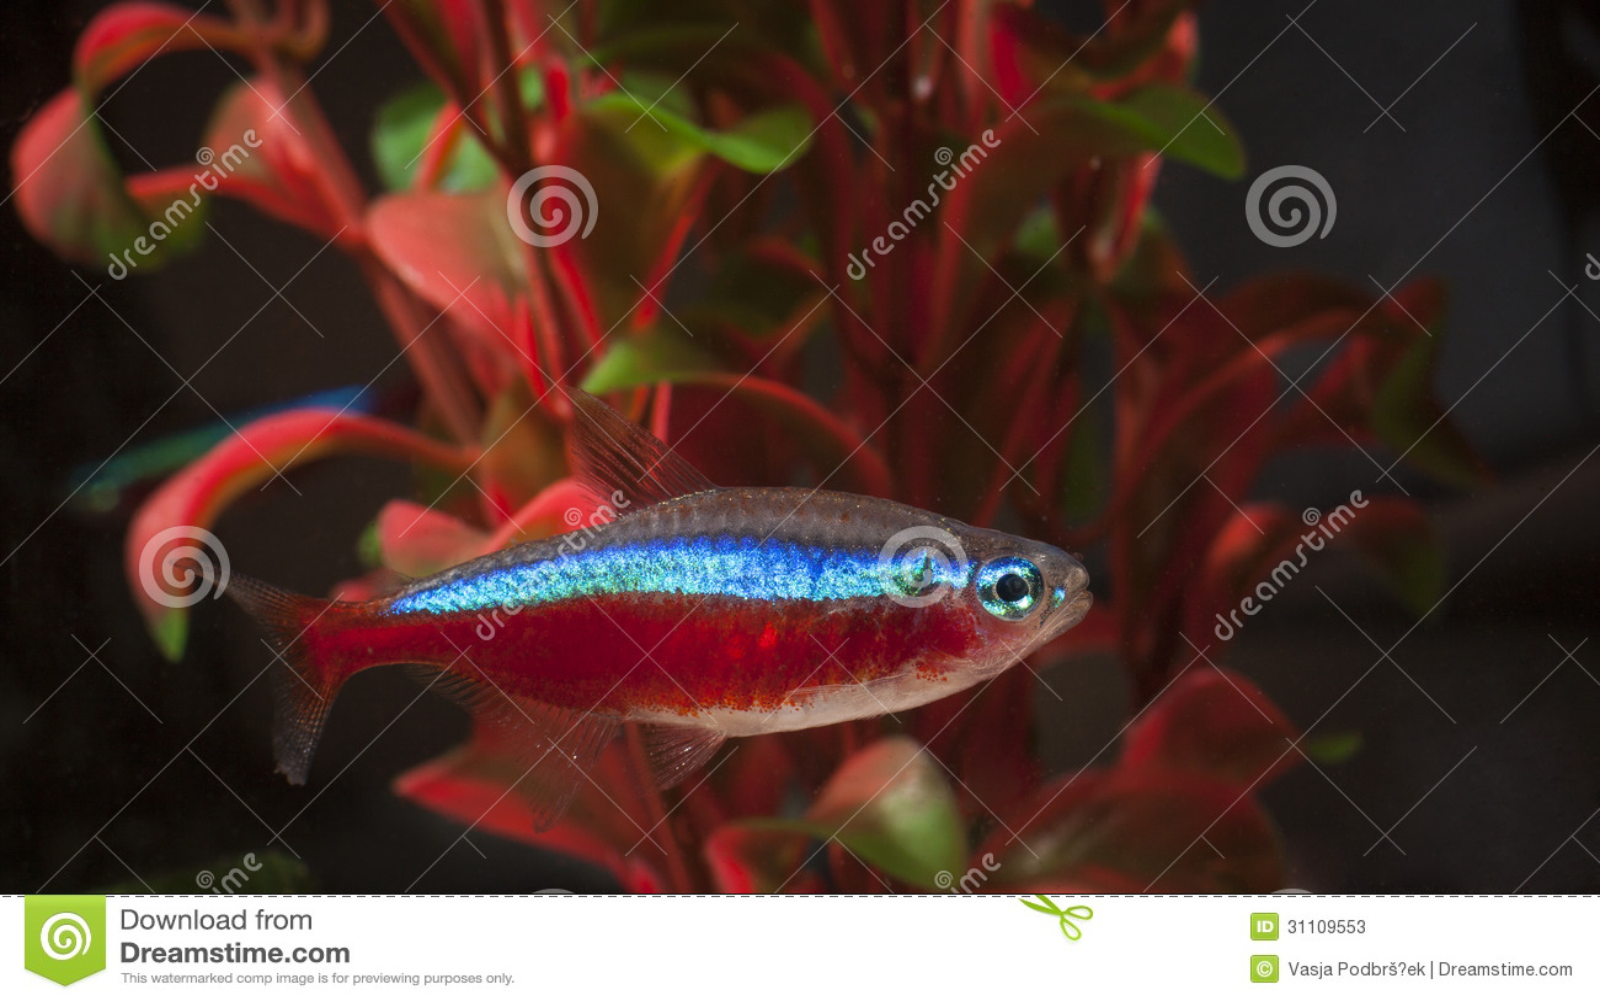 Neon tetra fish stock image. Image of close, small, hobby - 31109553